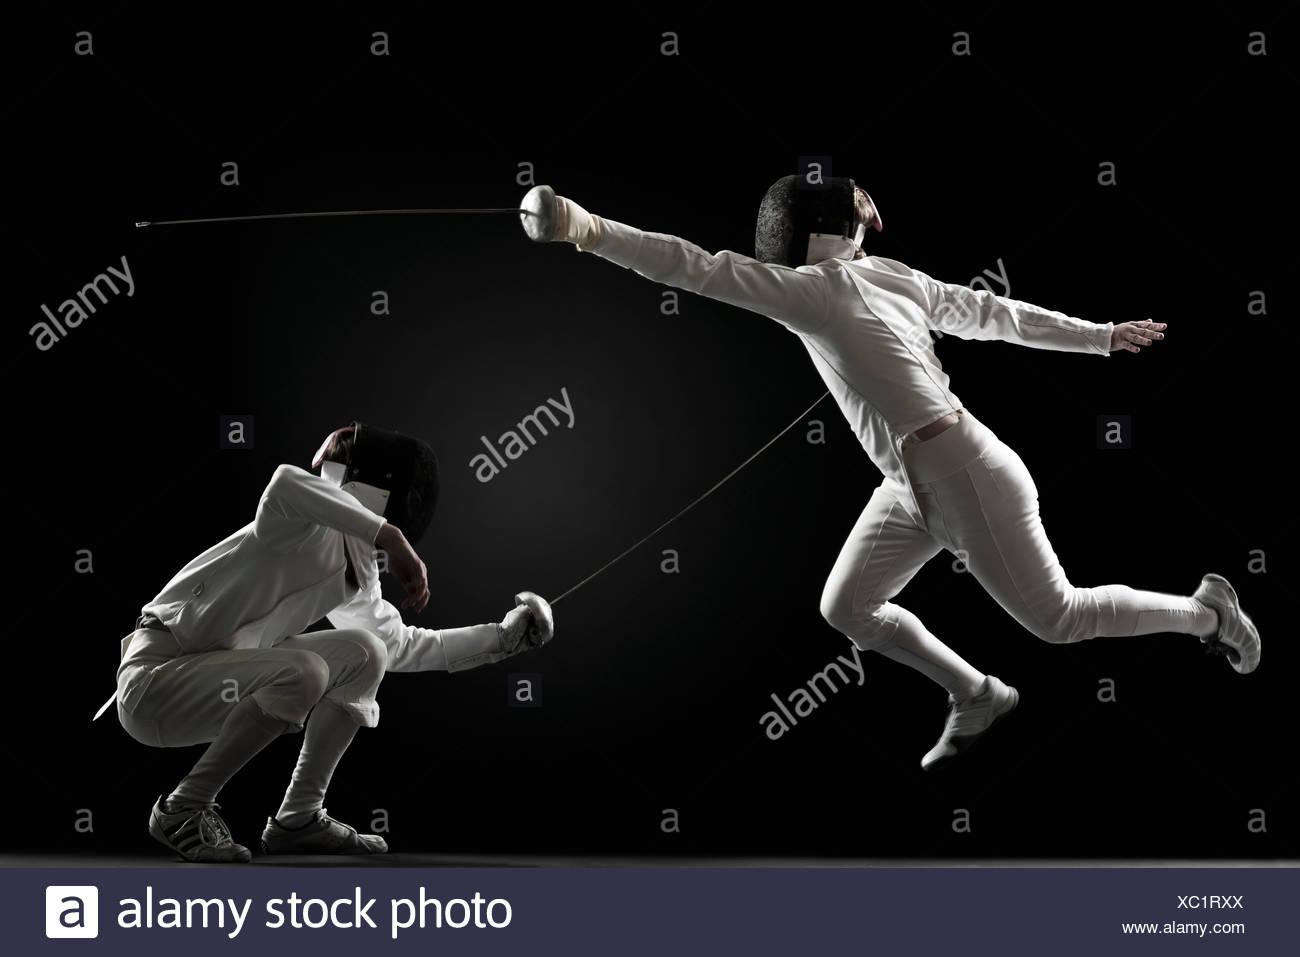 Tiradores de esgrima Imagen De Stock